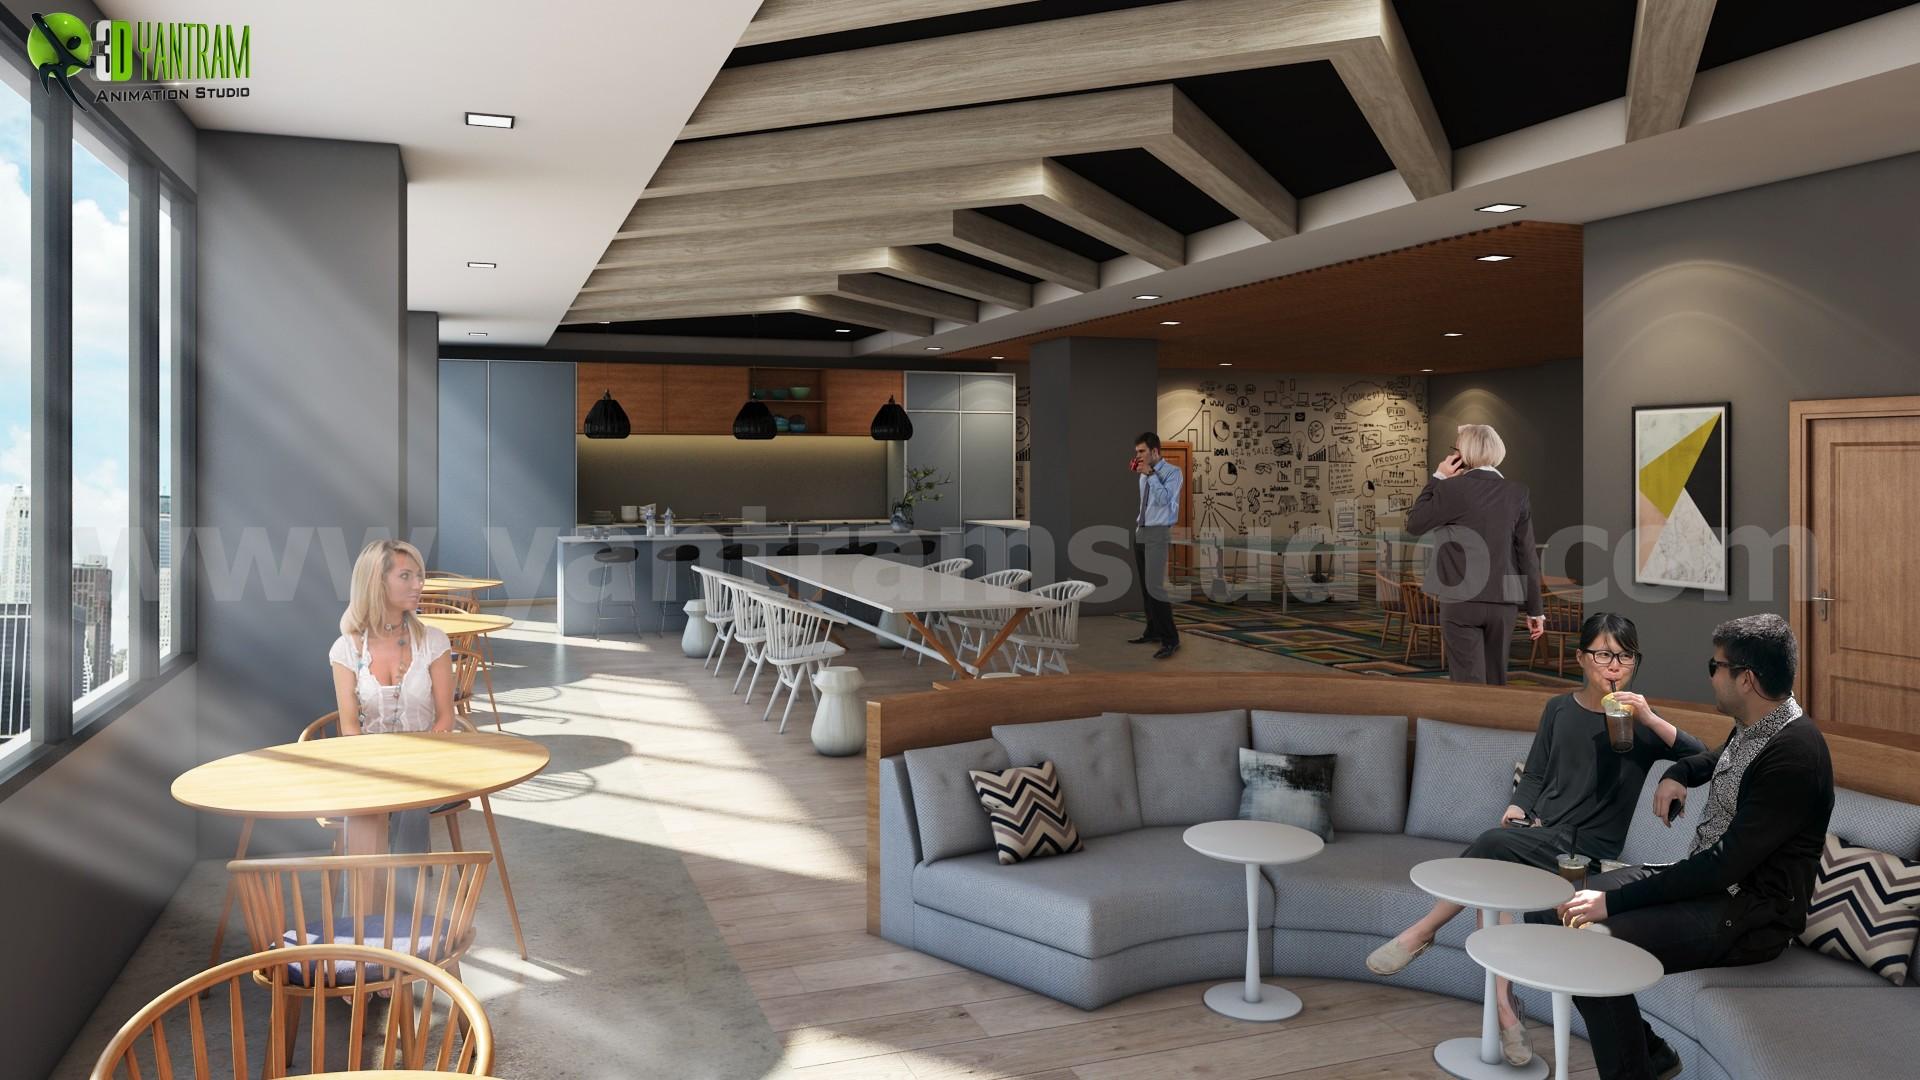 Yantram Architectural Design Studio Modern Office Interior Design Ideas For Kitchen Pantry And Waiting Areas Cape Town Australia